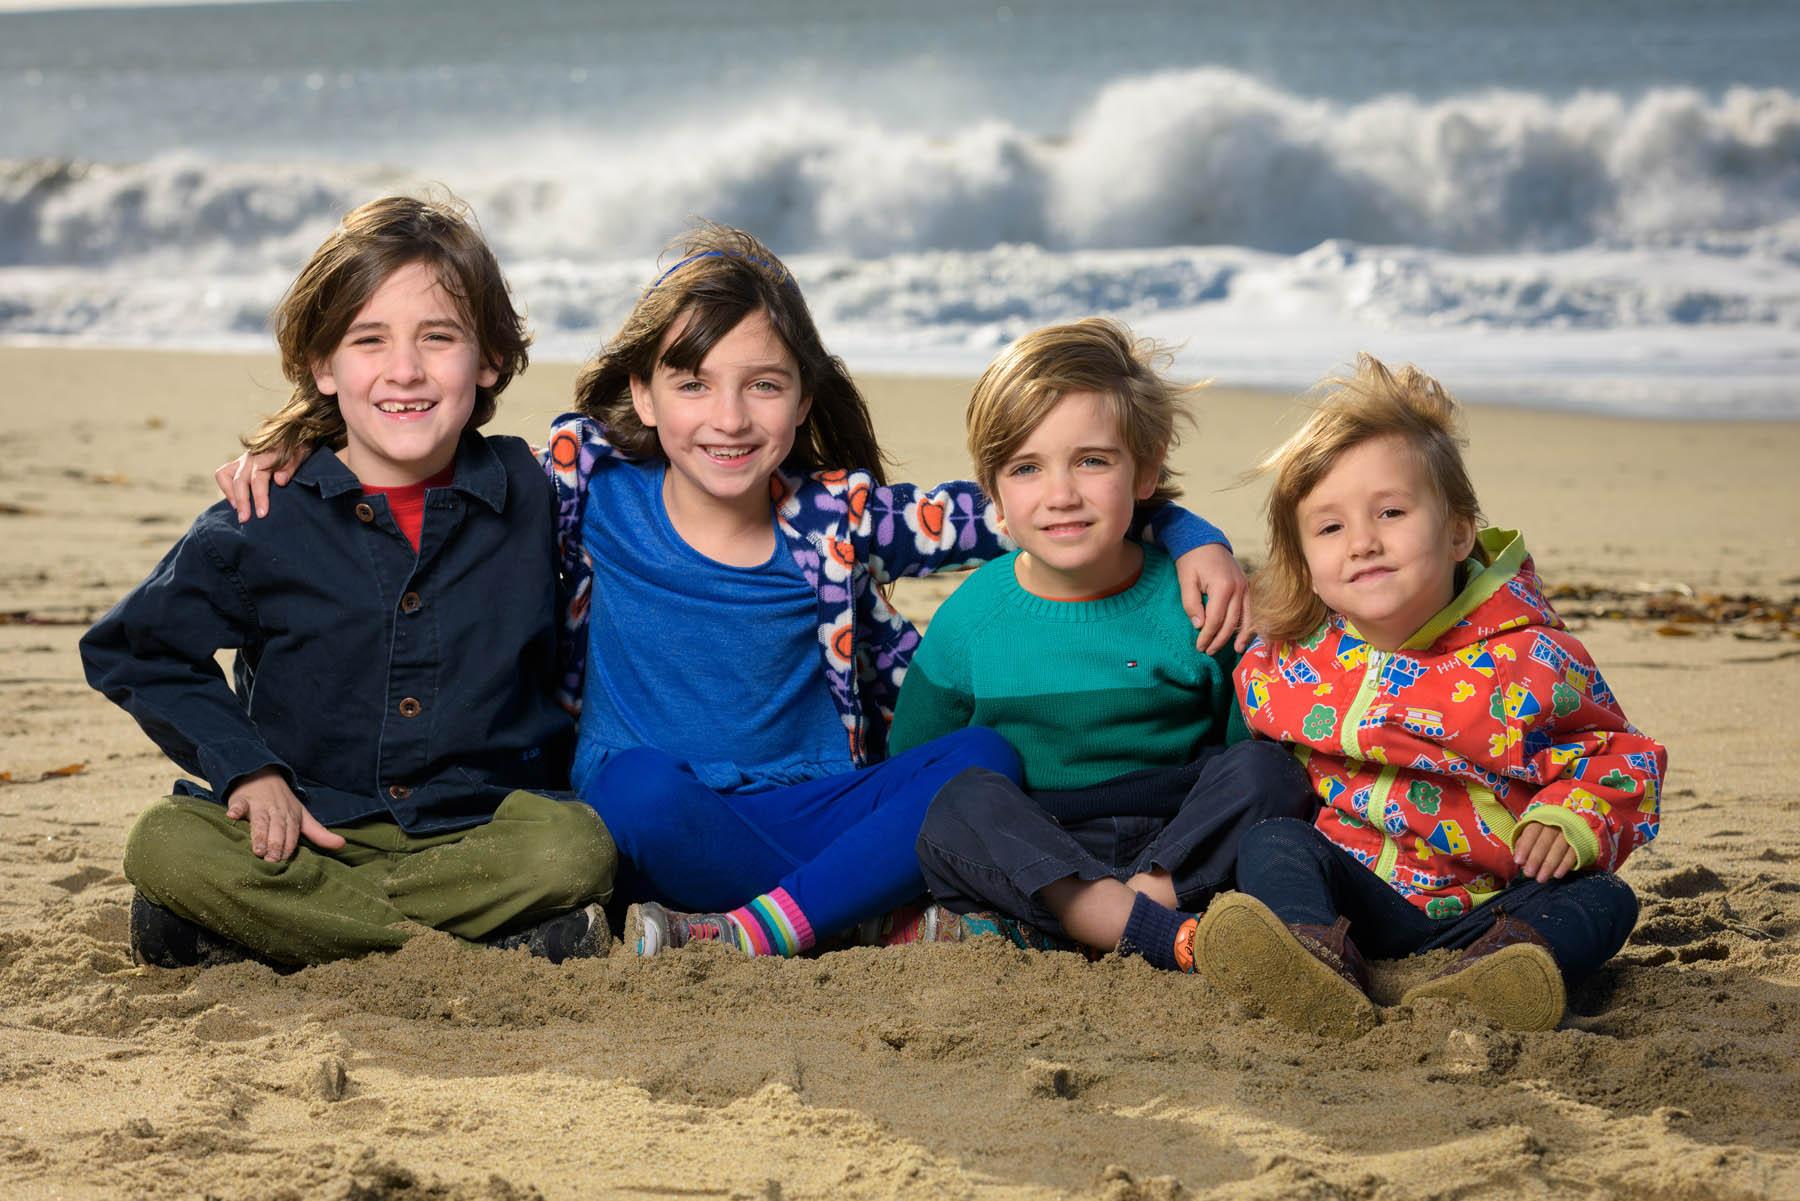 1254_d800b_Judy_G_Seabright_Beach_Santa_Cruz_Multi-Family_Photography_Portraits.jpg